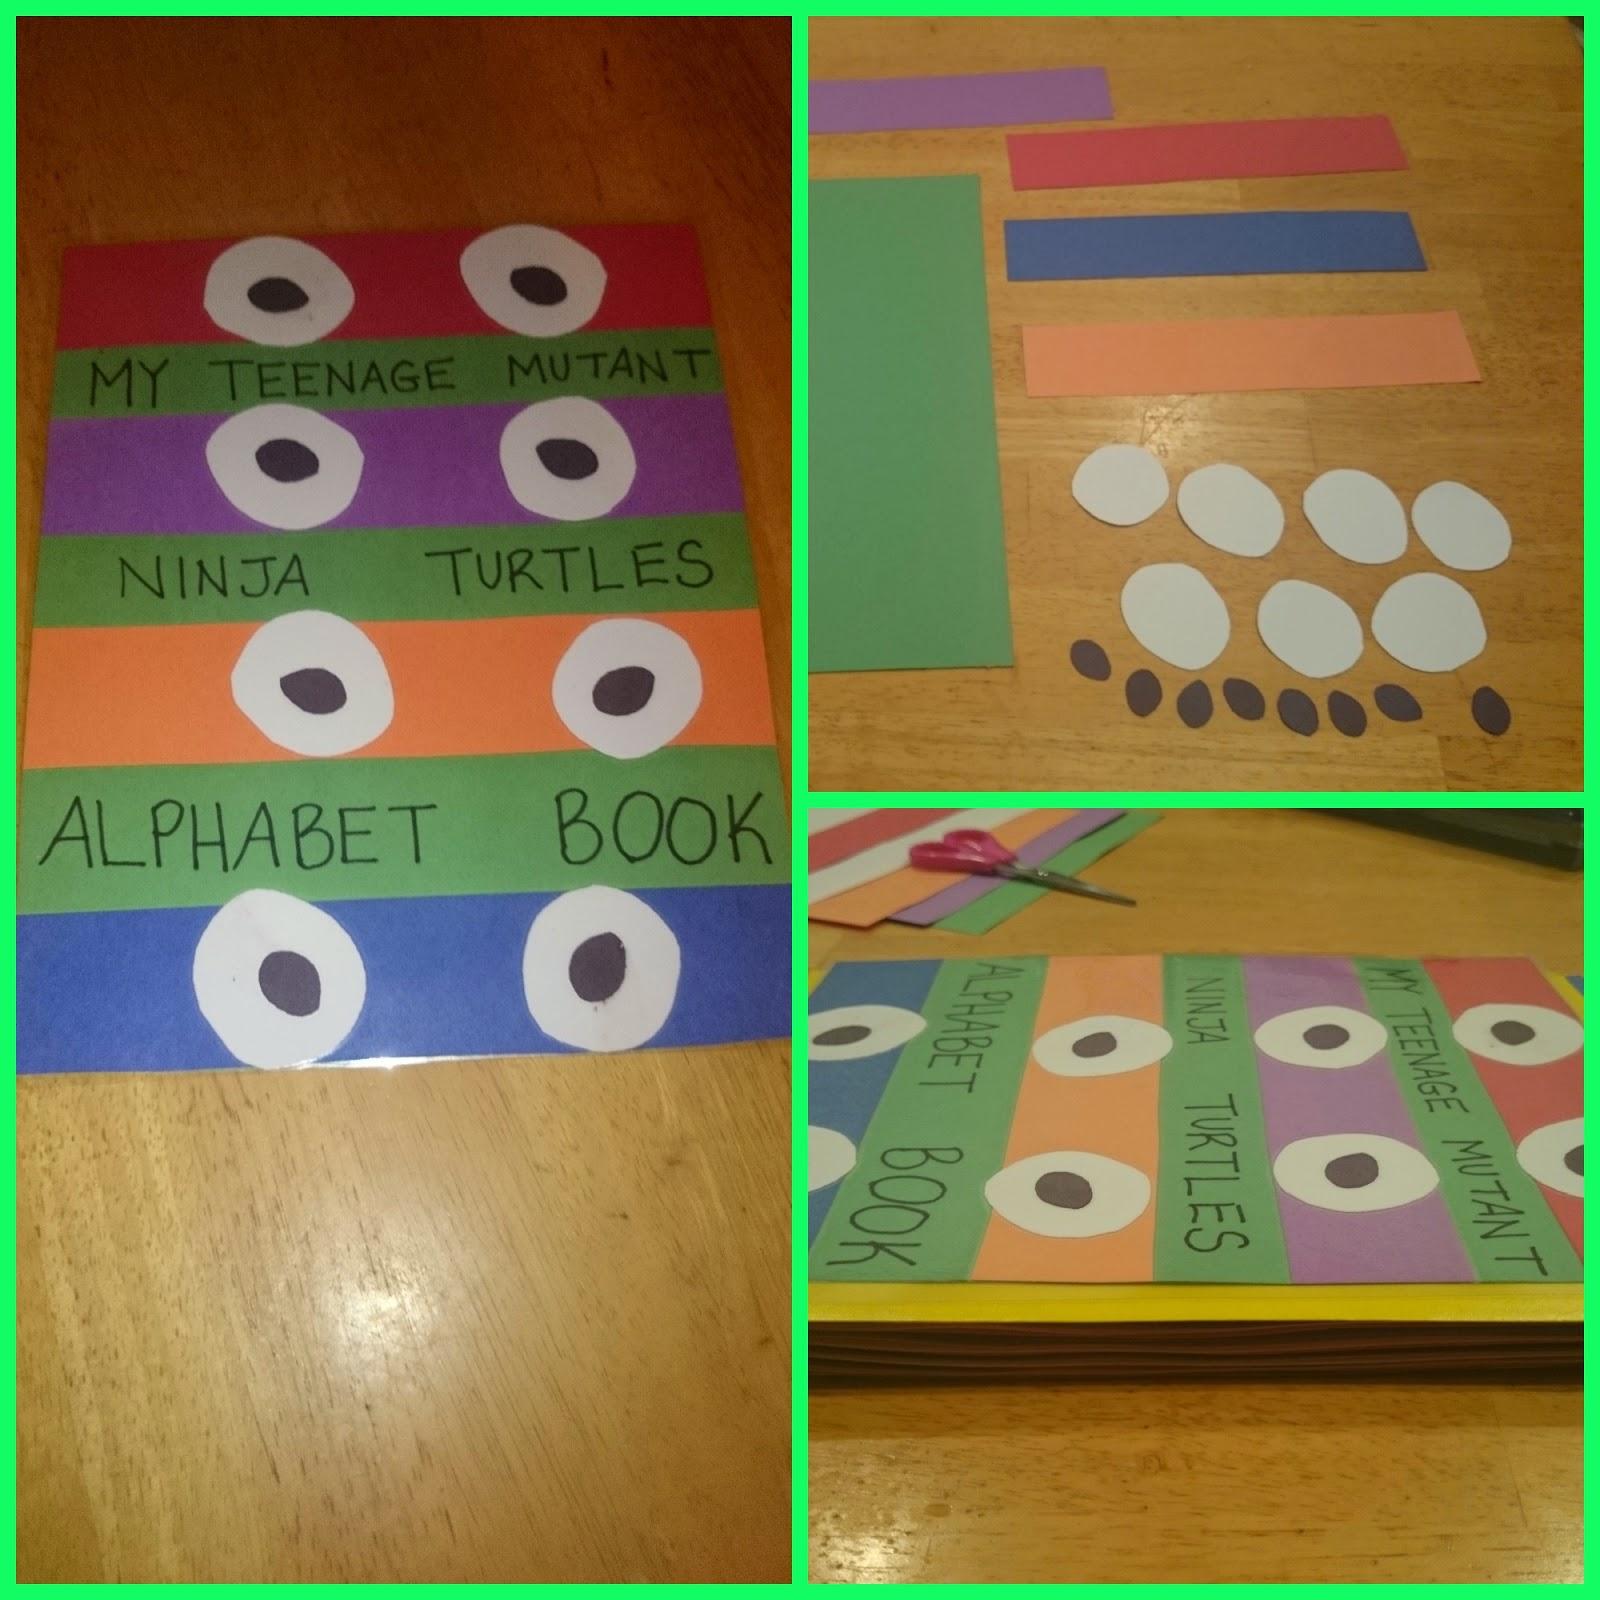 Raising Samuels Life Teenage Mutant Ninja Turtles Inspired Alphabet Book